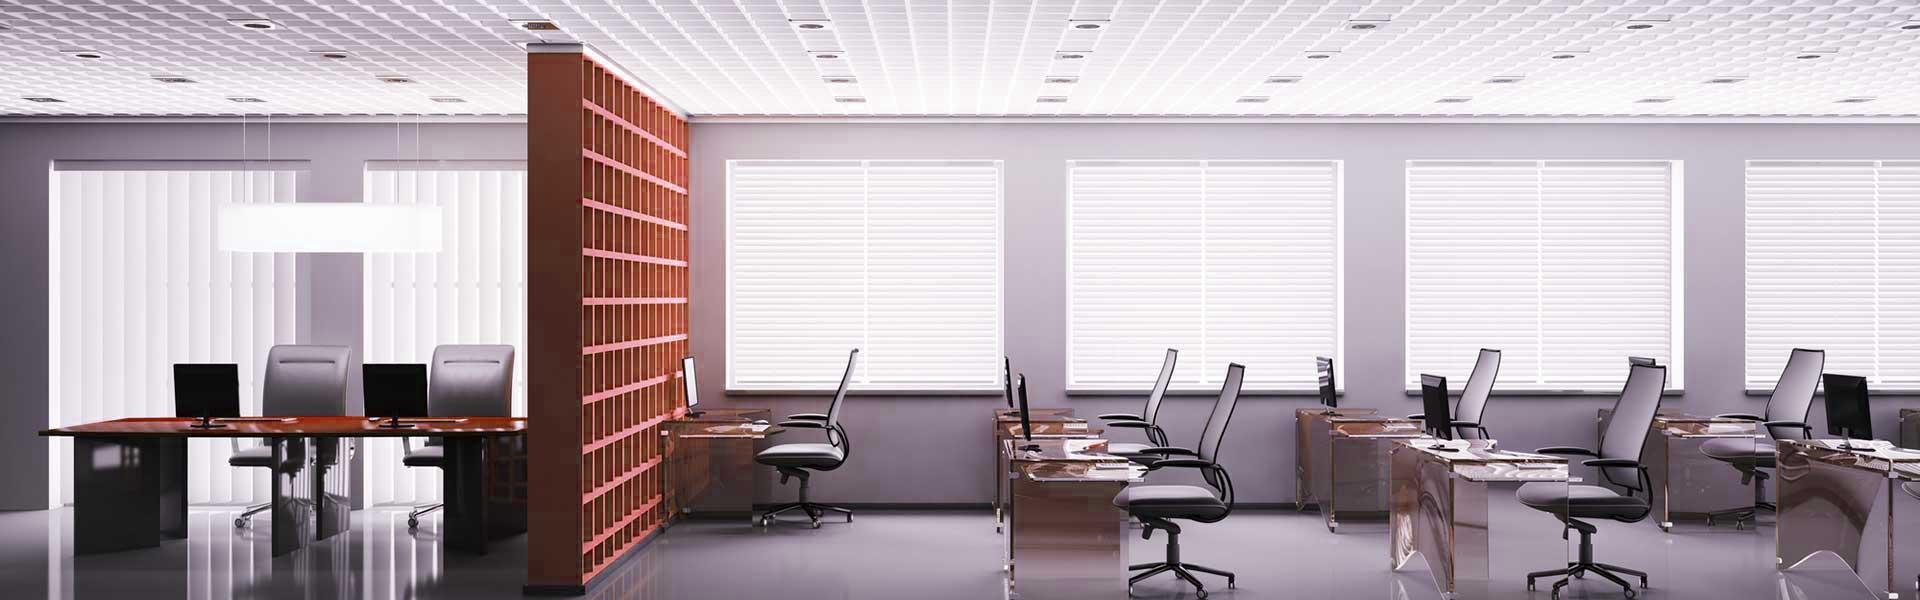 Office Furniture in Huddersfield